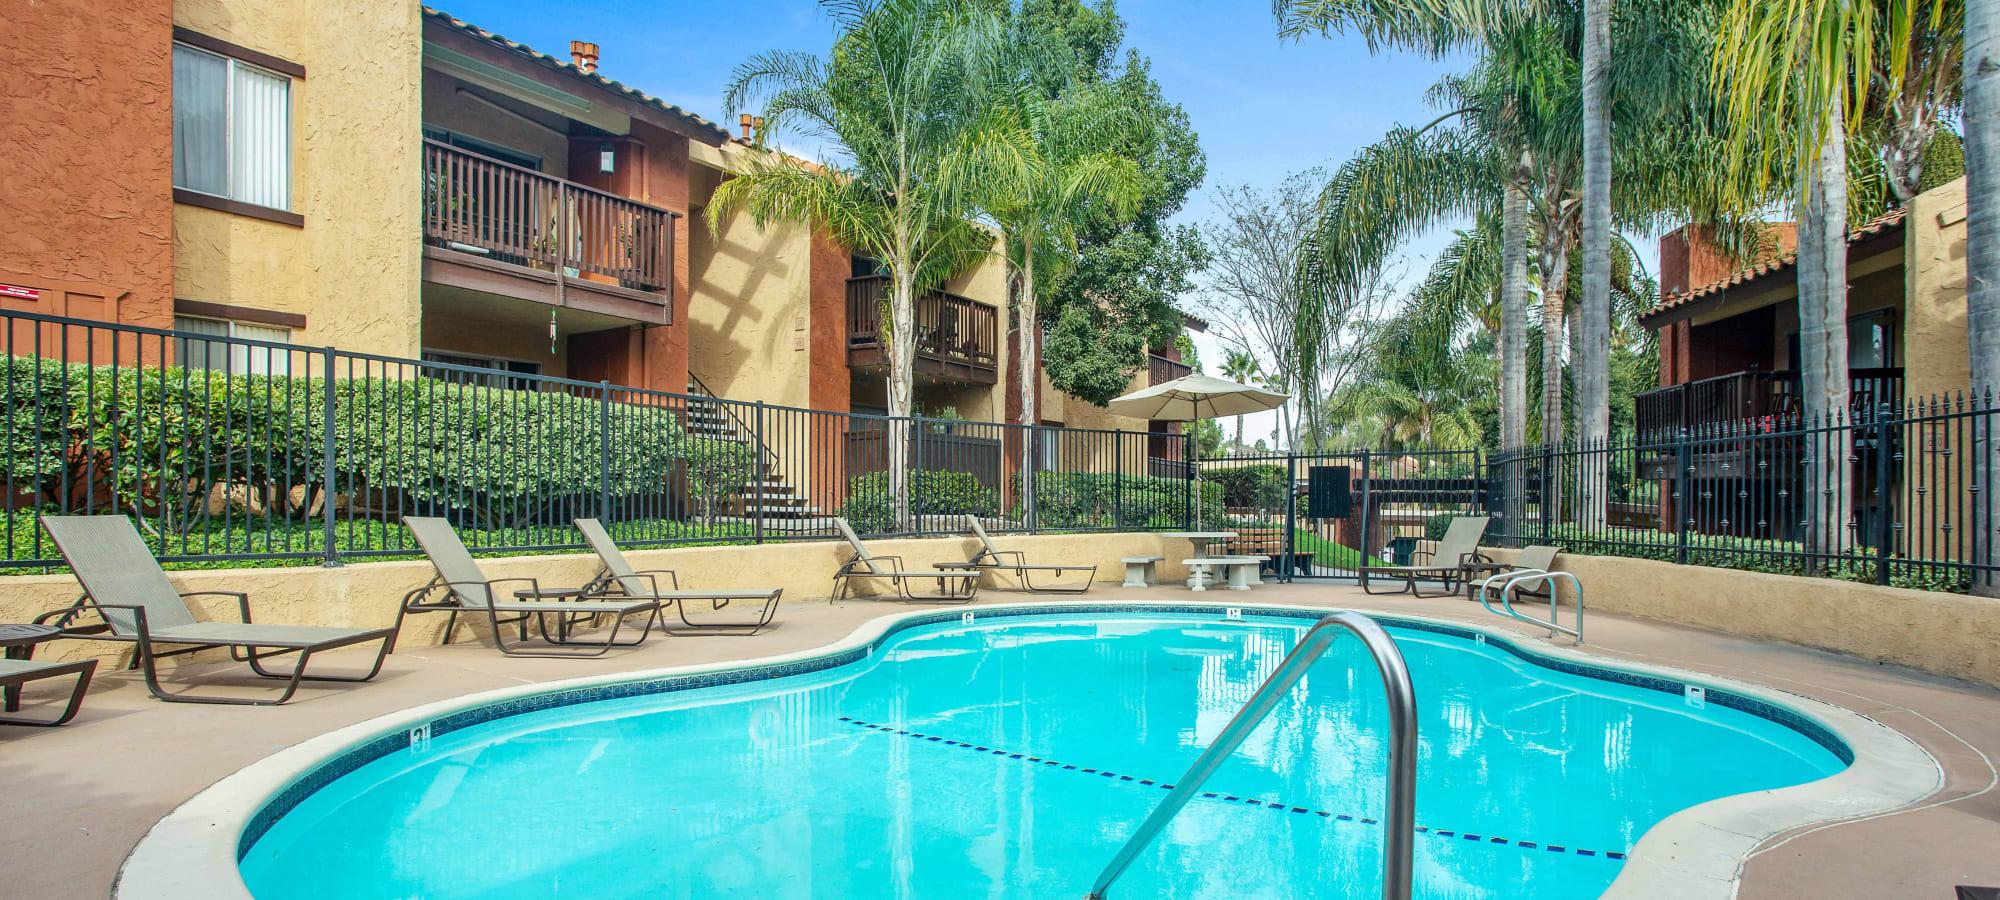 Shadow Ridge Apartments in Oceanside, California